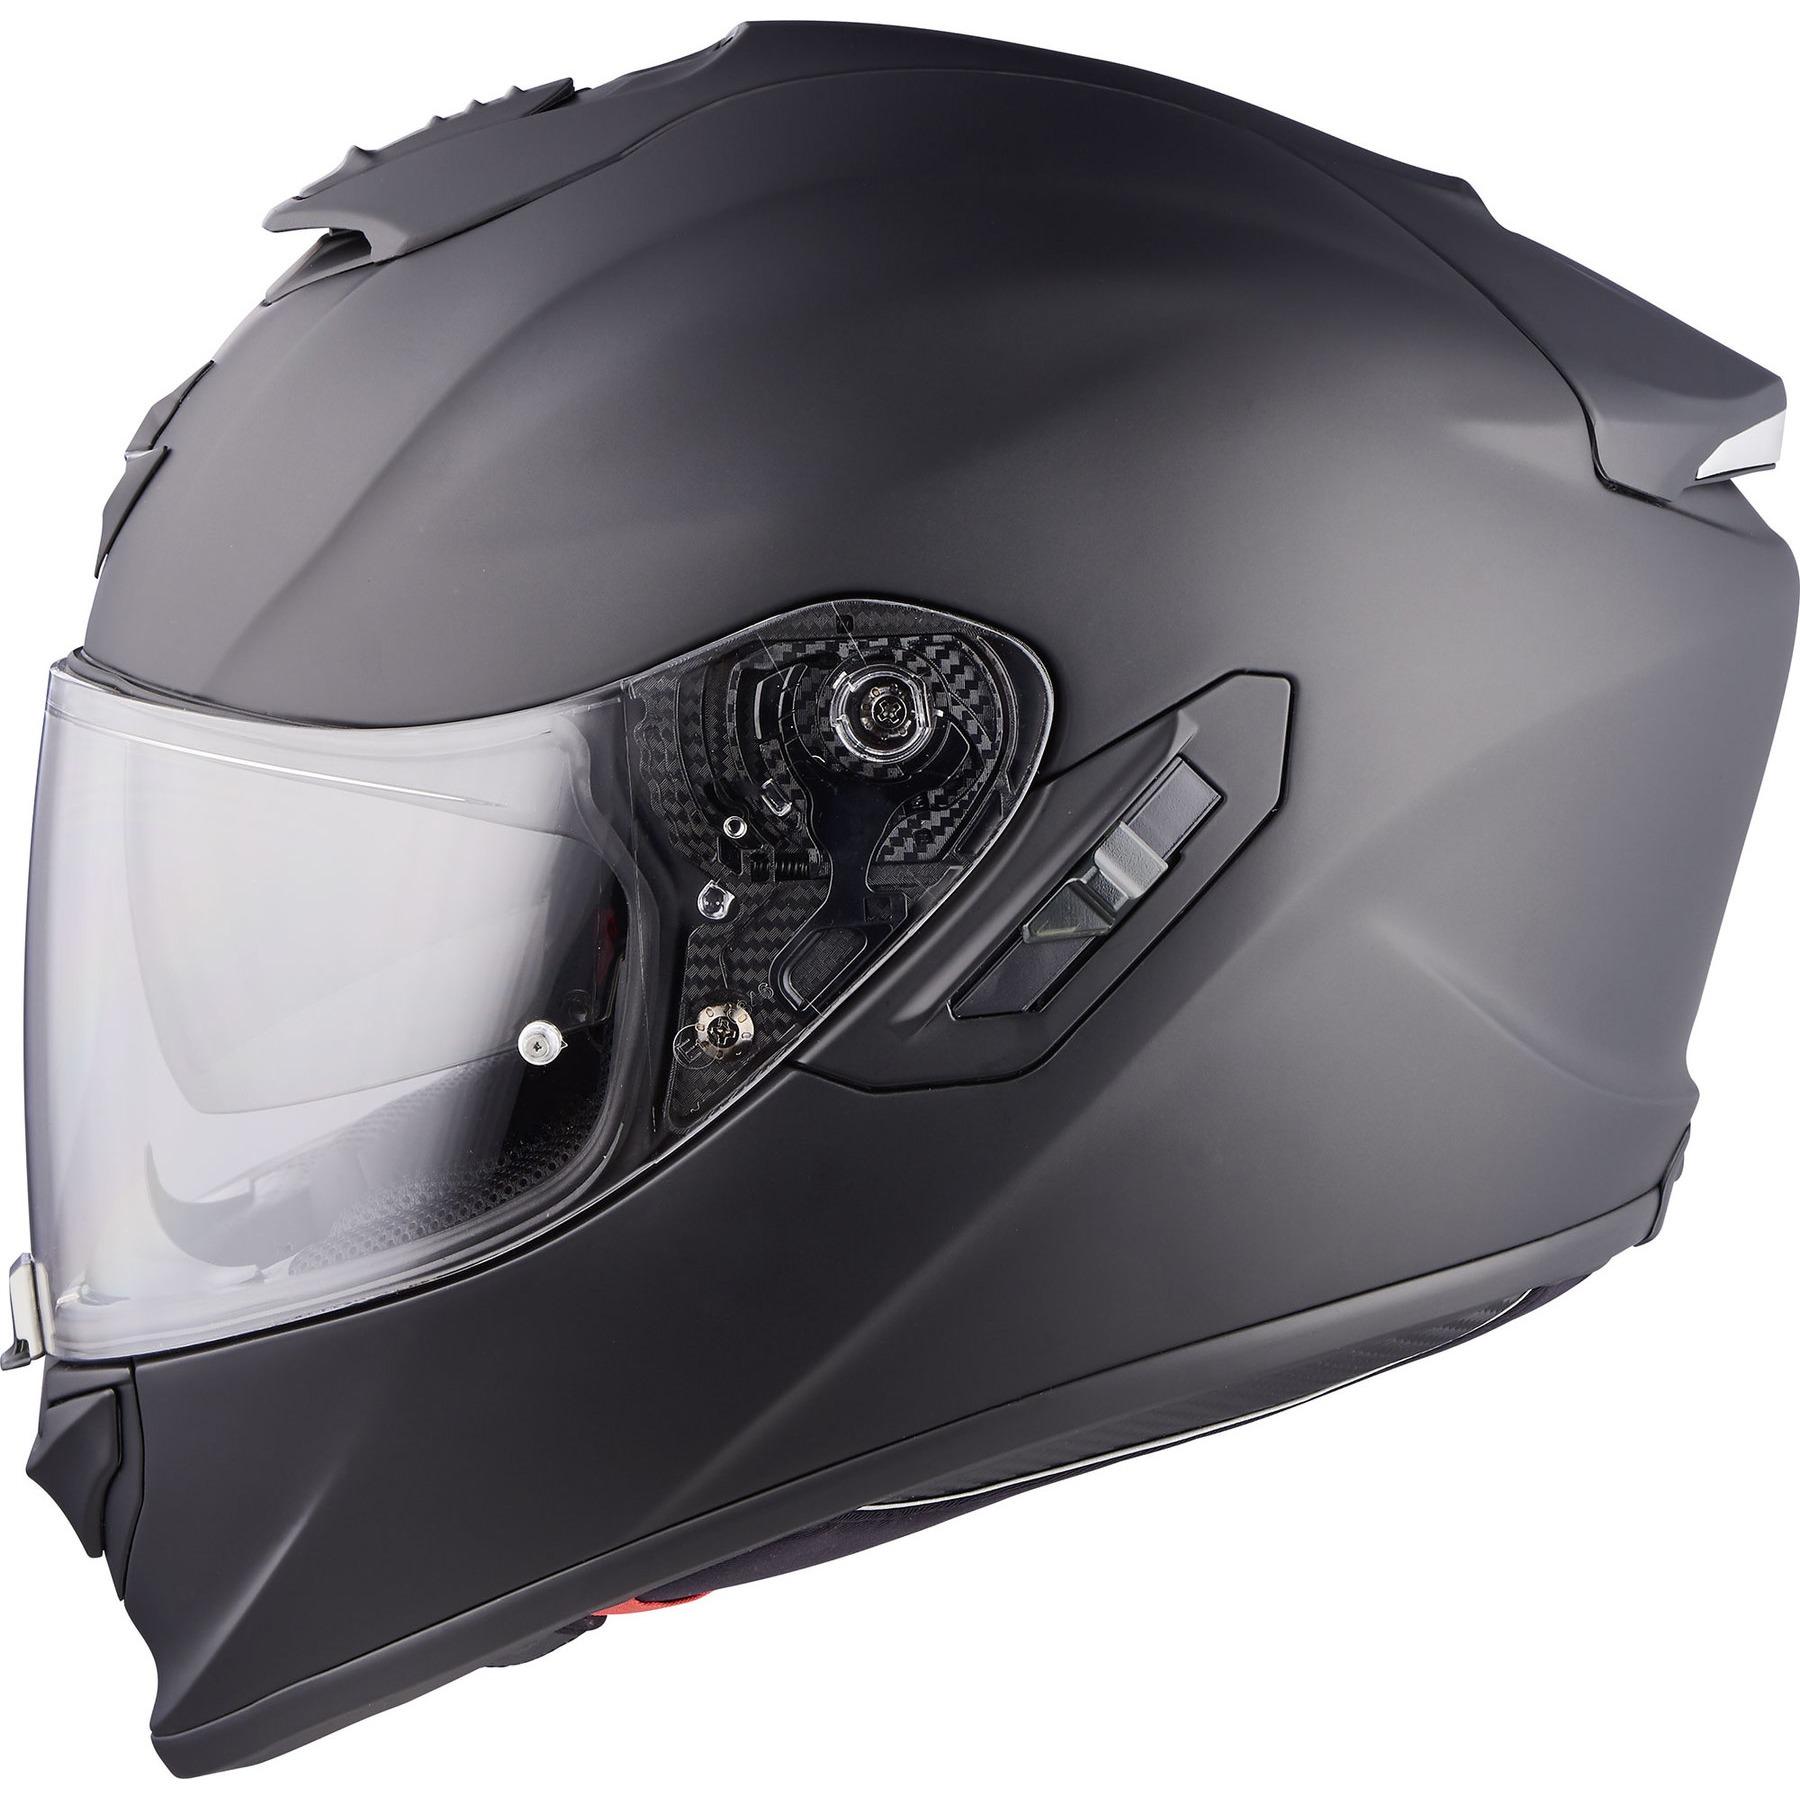 Free P/&P Scorpion EXO 1400 Air Solid Glossy Black Full Face Motorcycle Helmet